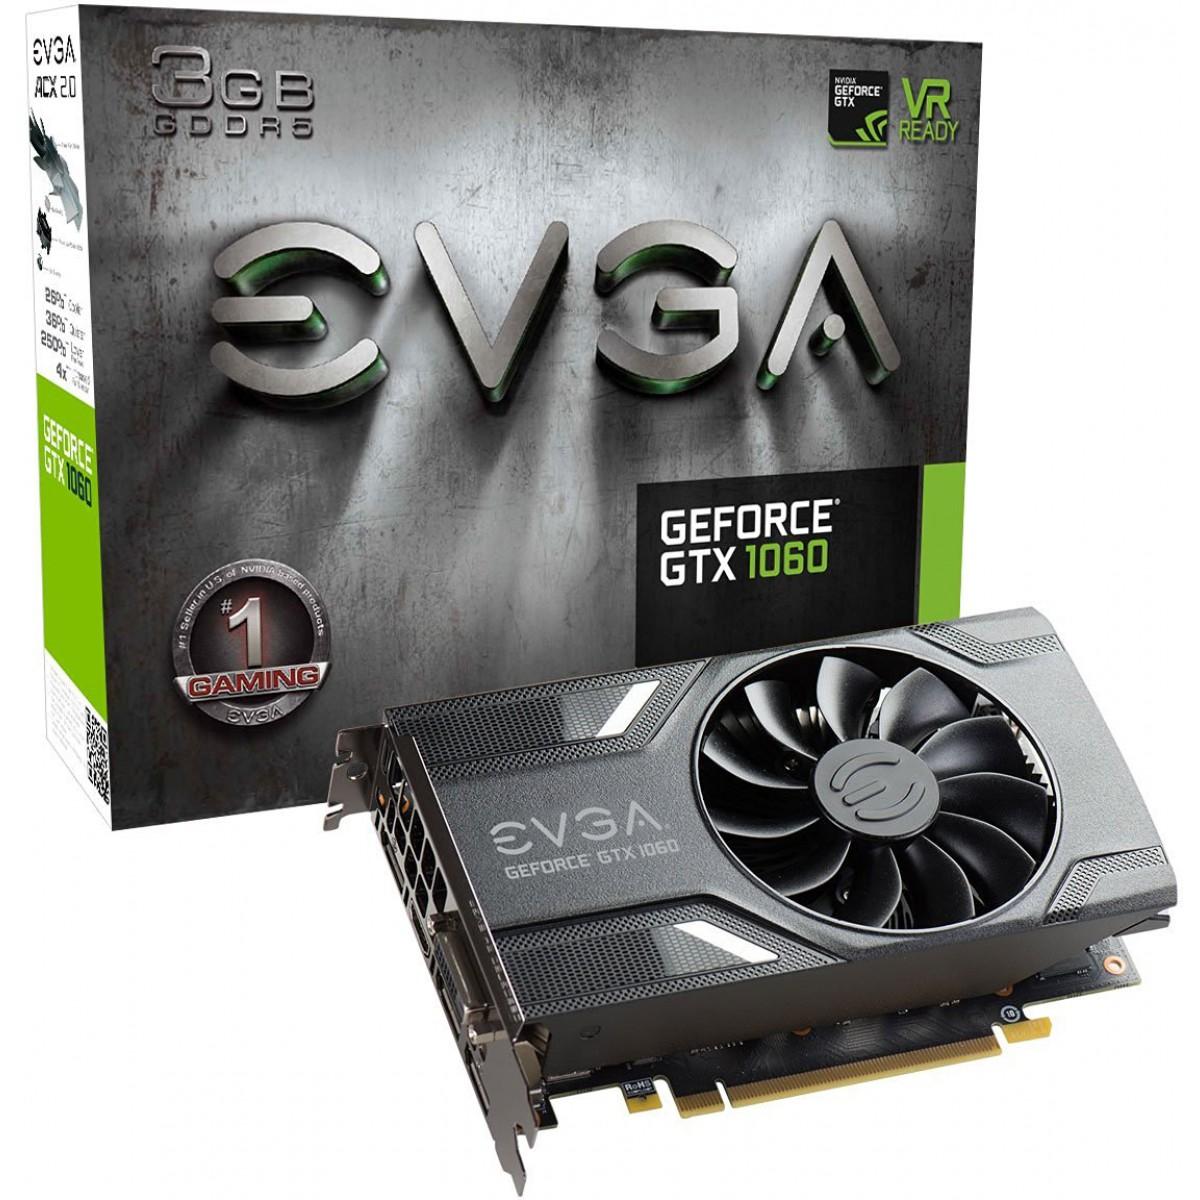 PLACA DE VIDEO EVGA GEFORCE GTX 1060 GAMING 3GB GDDR5 PCI-EXP